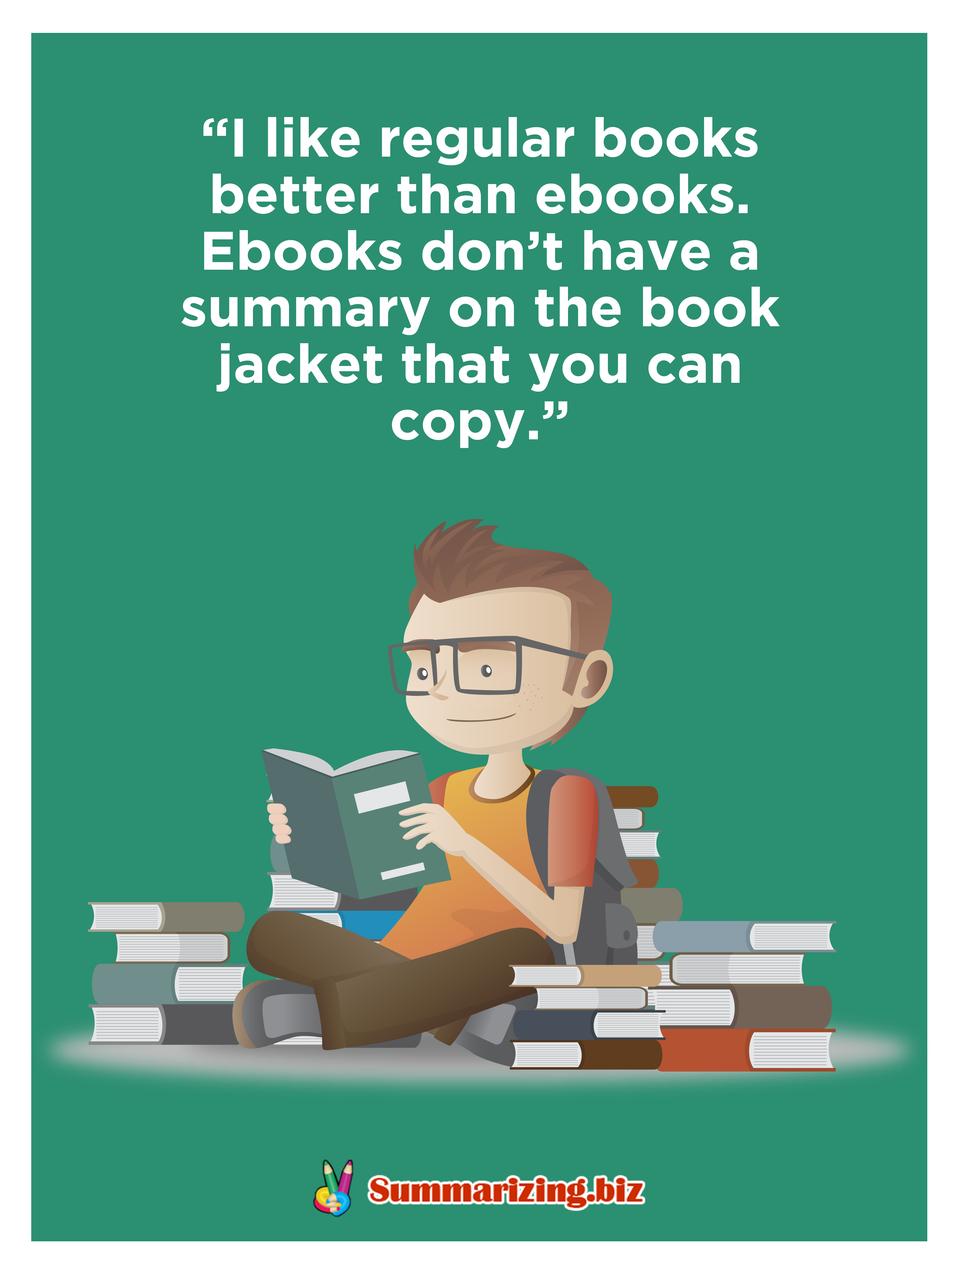 Article Summarie Help Summarizing Strategie Summary Book Jacket Paraphrase Of The Time Machine